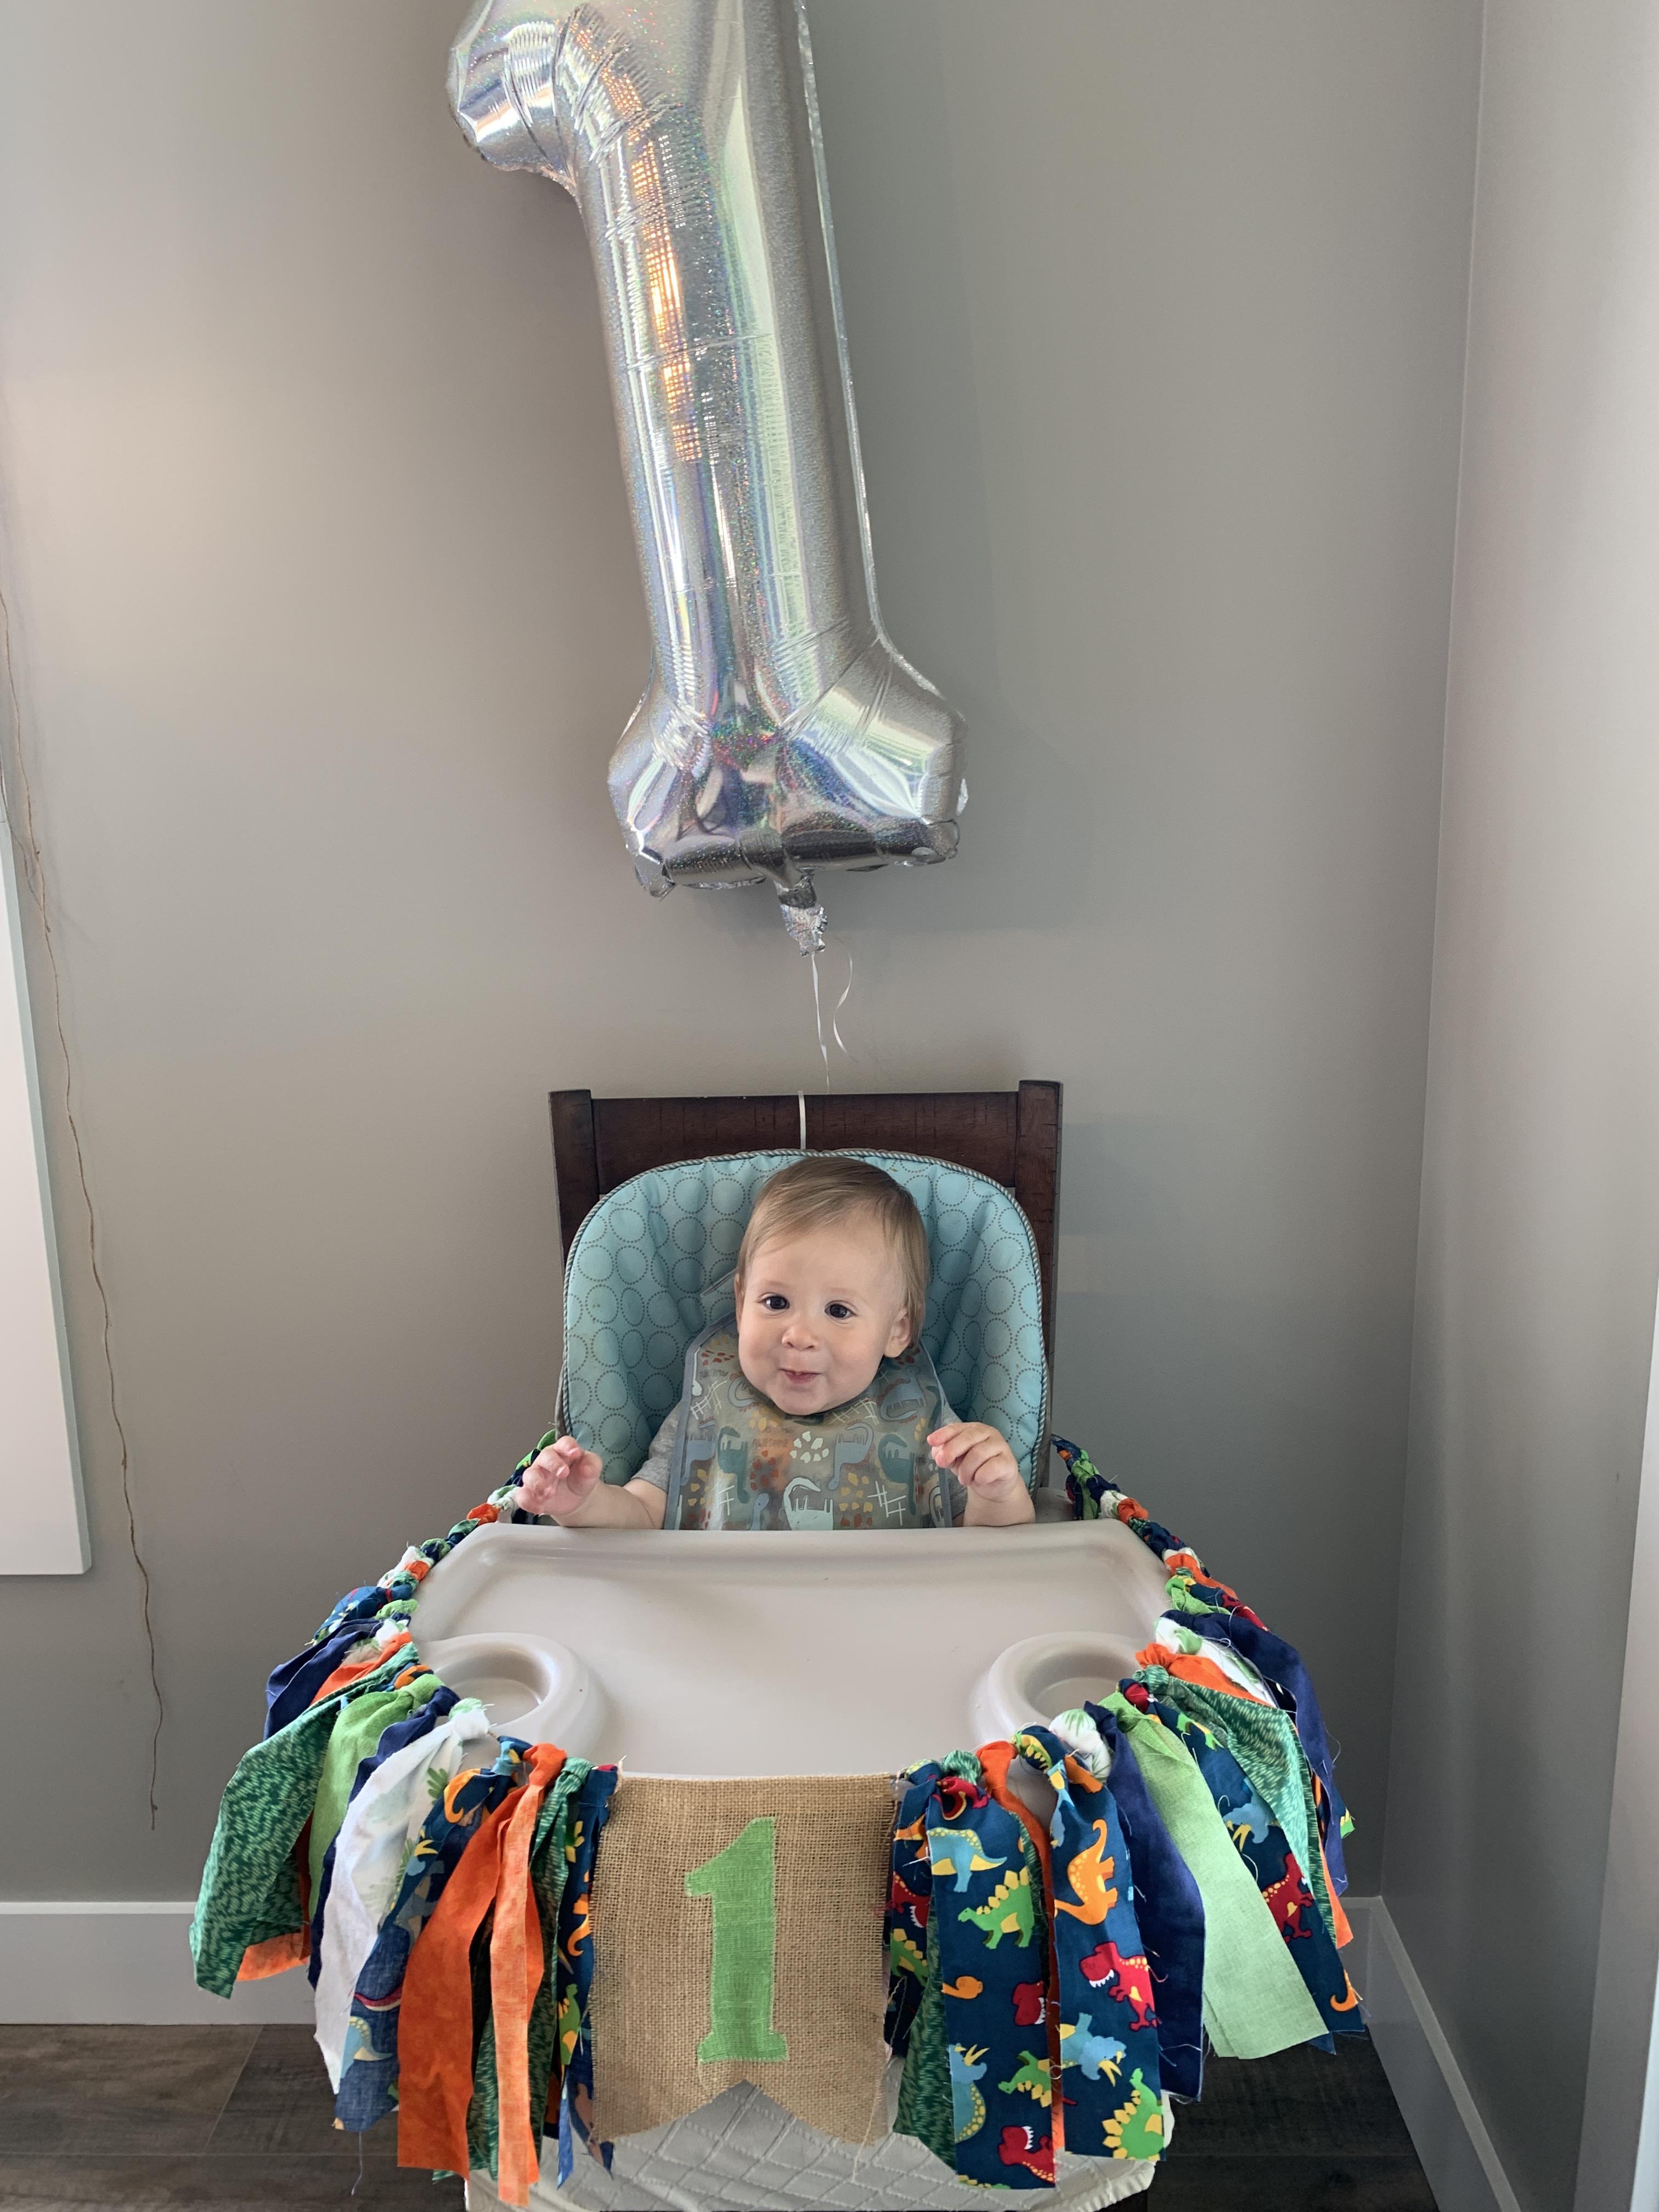 Brody-1balloon